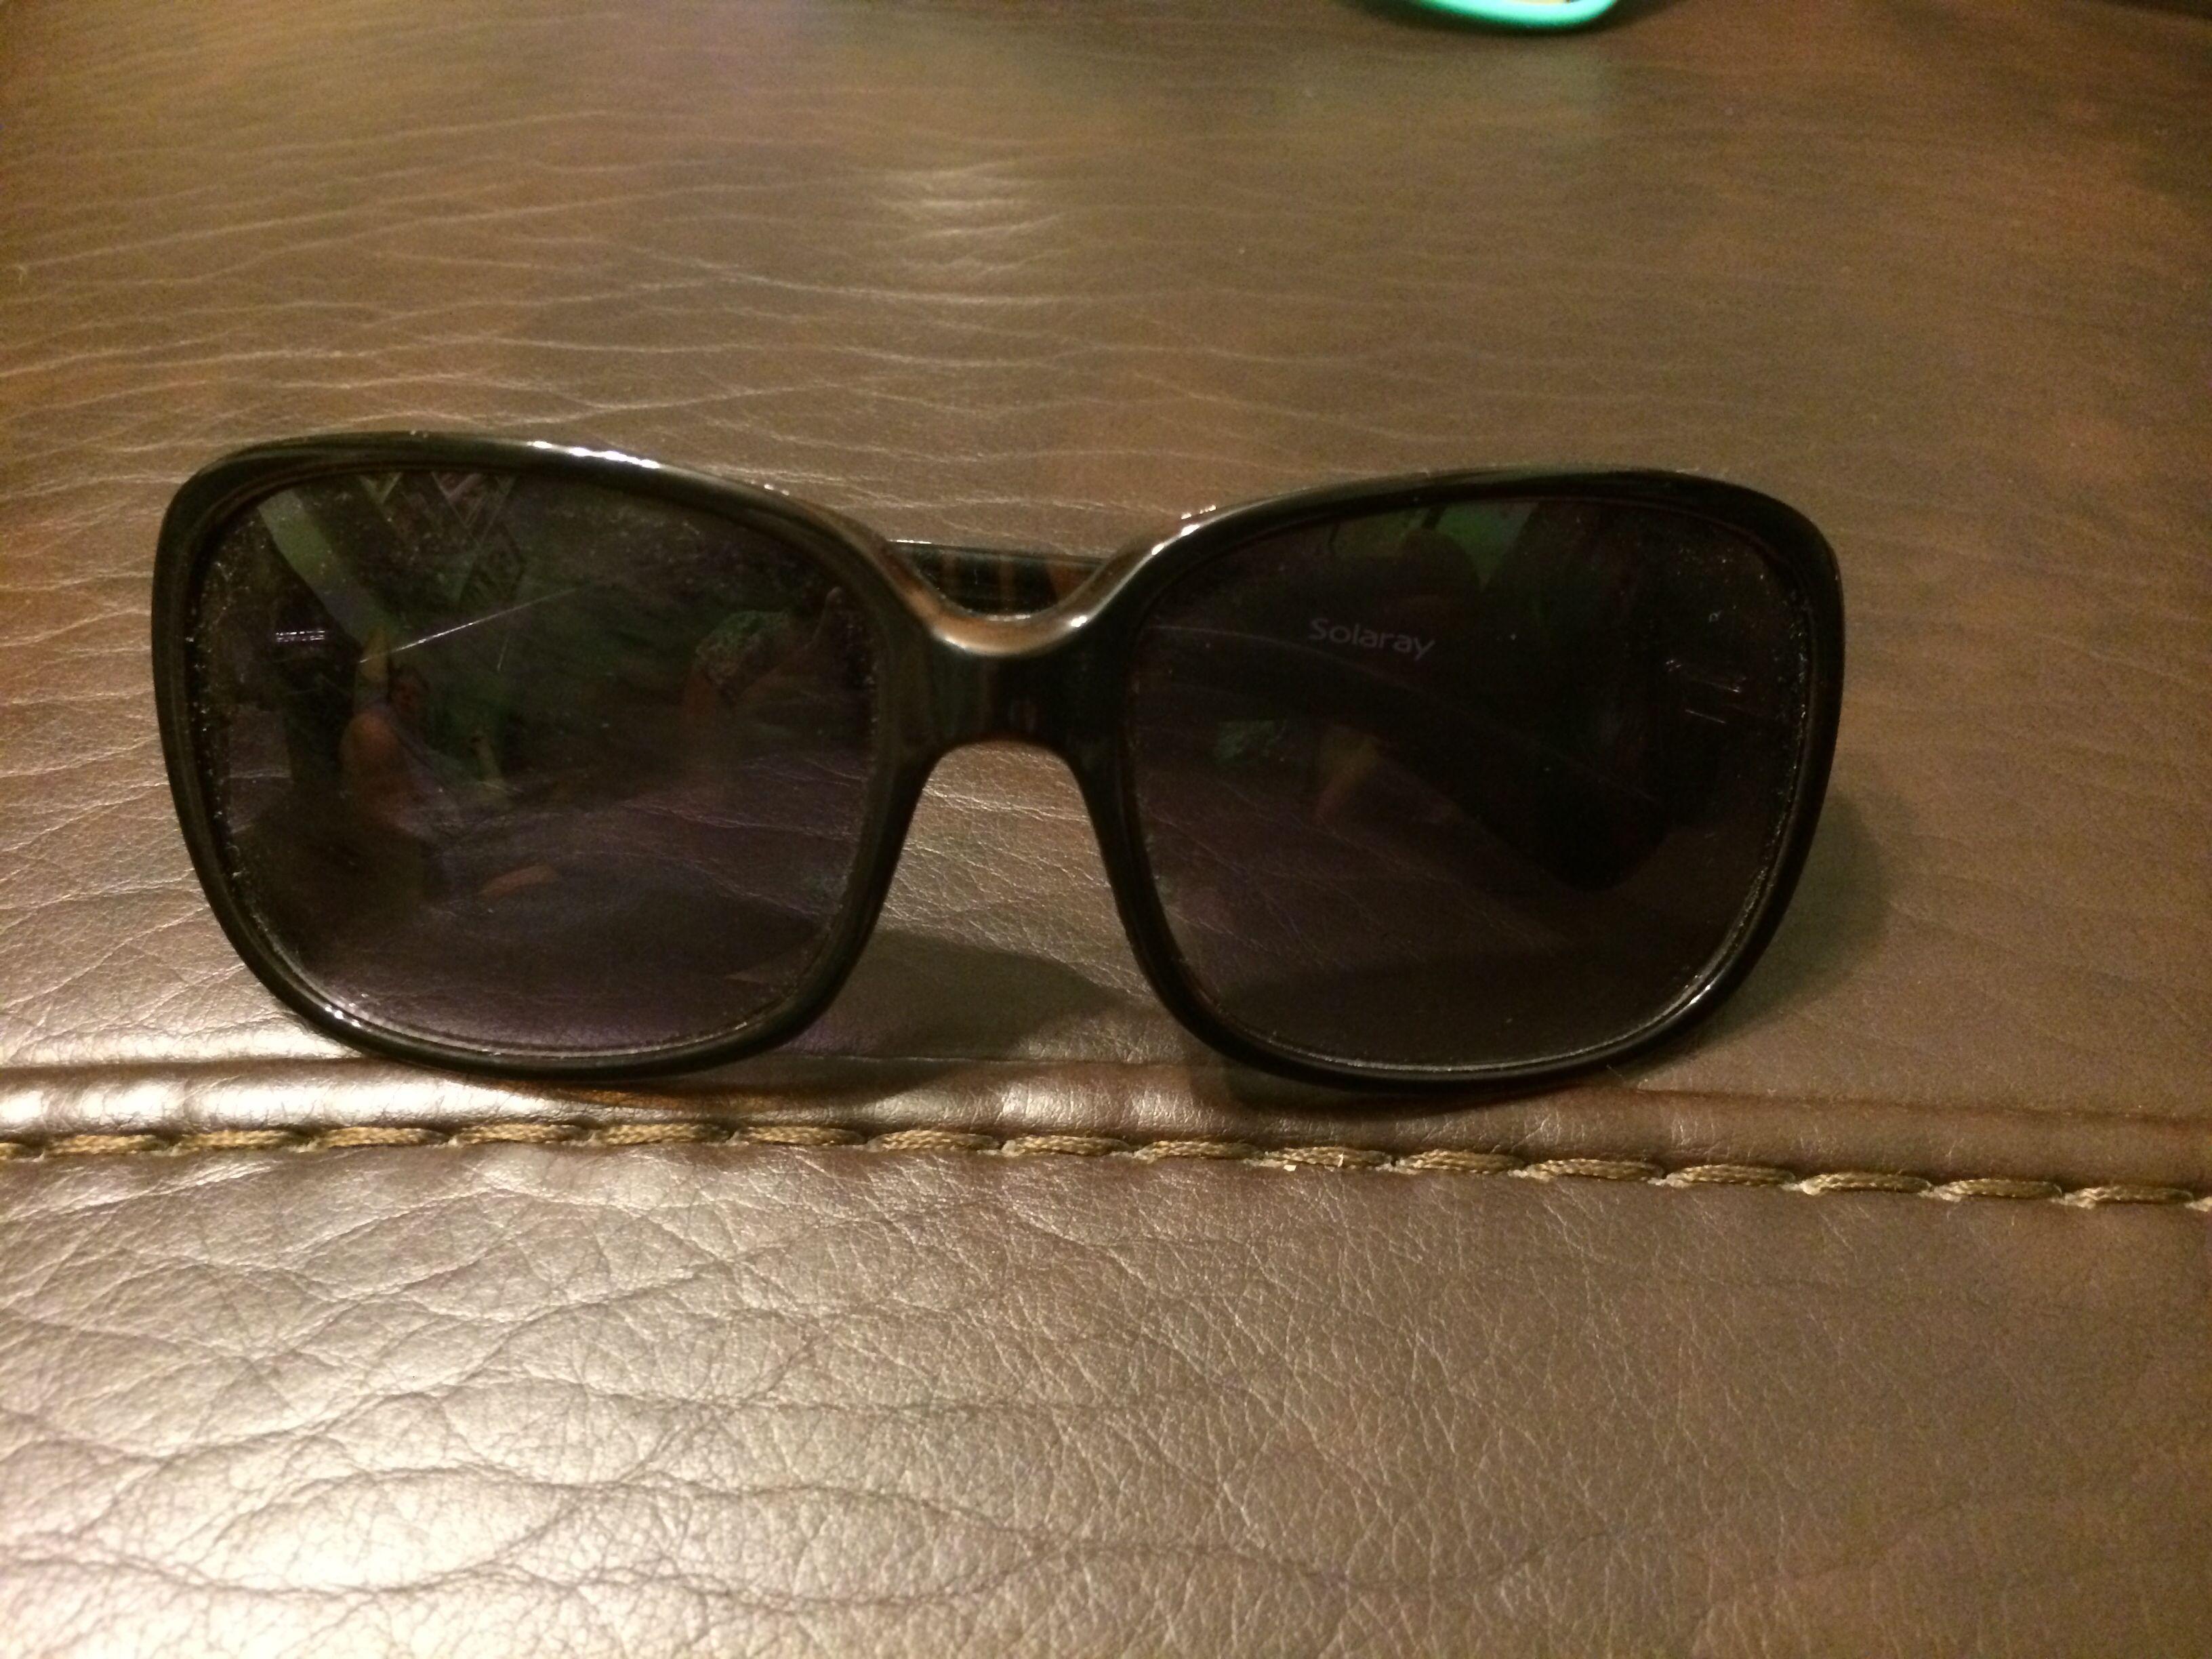 My sleek lady sunglasses